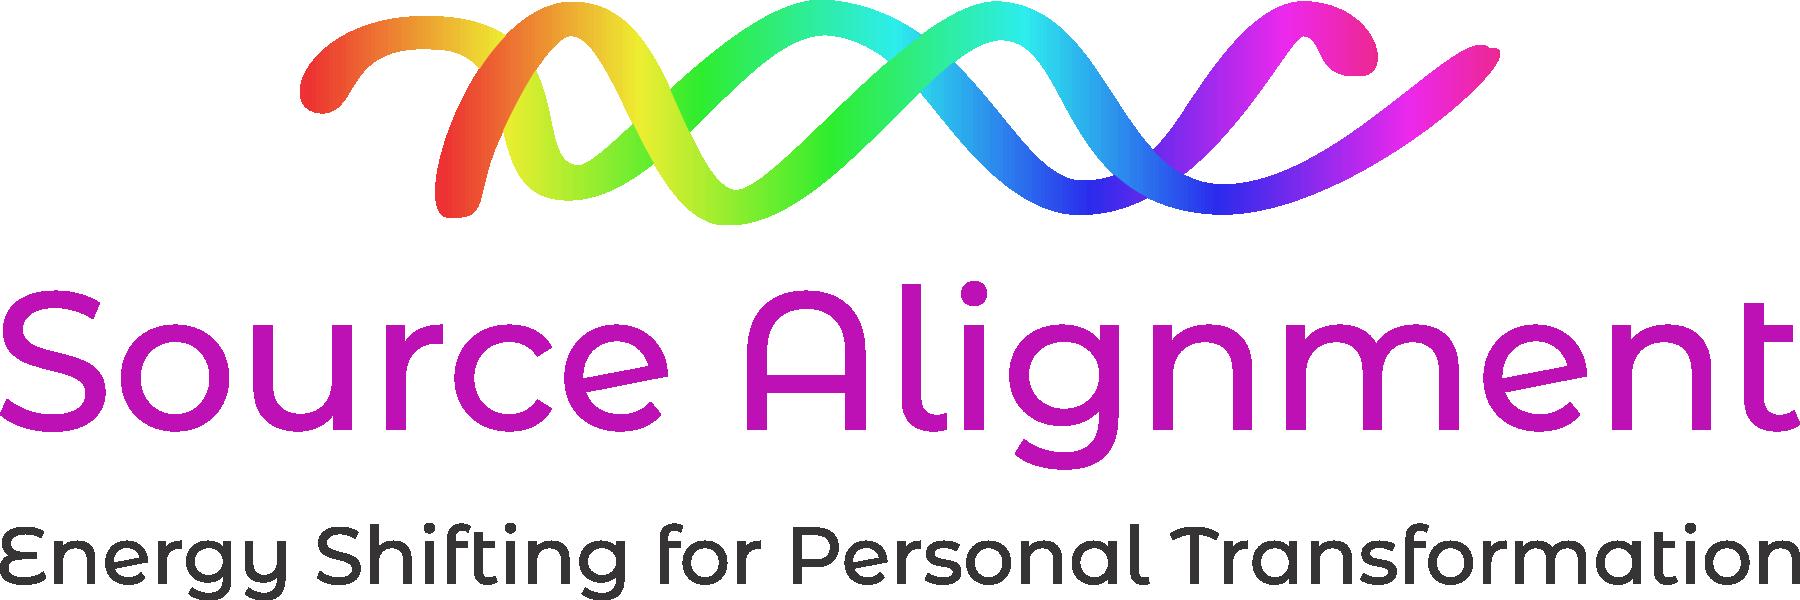 Source-Alignment